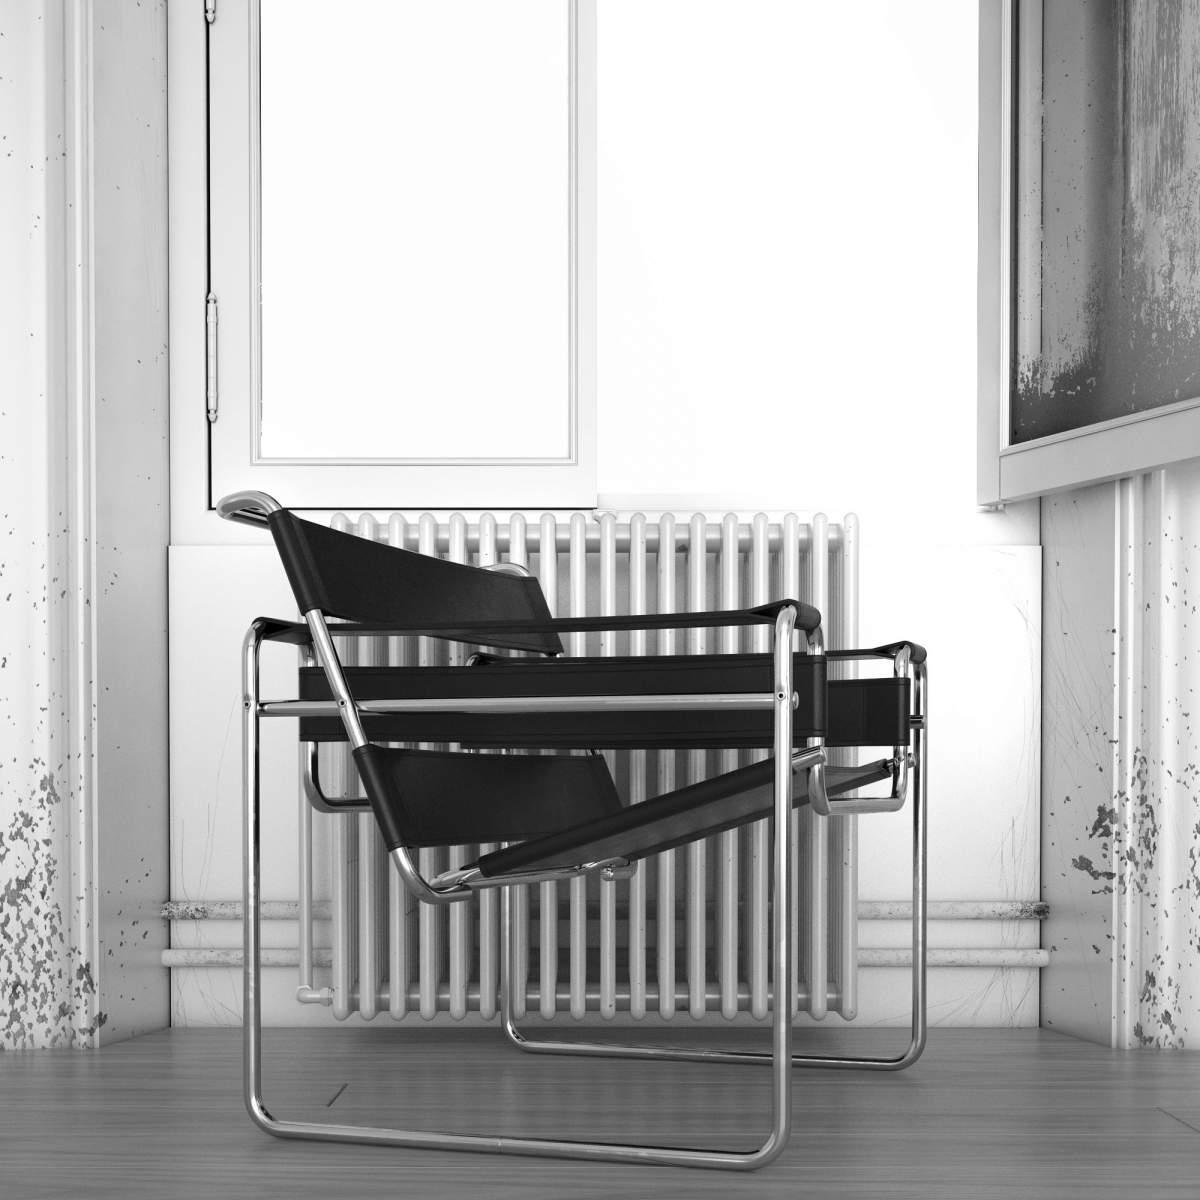 Wassily Chair par Marcel Breuer